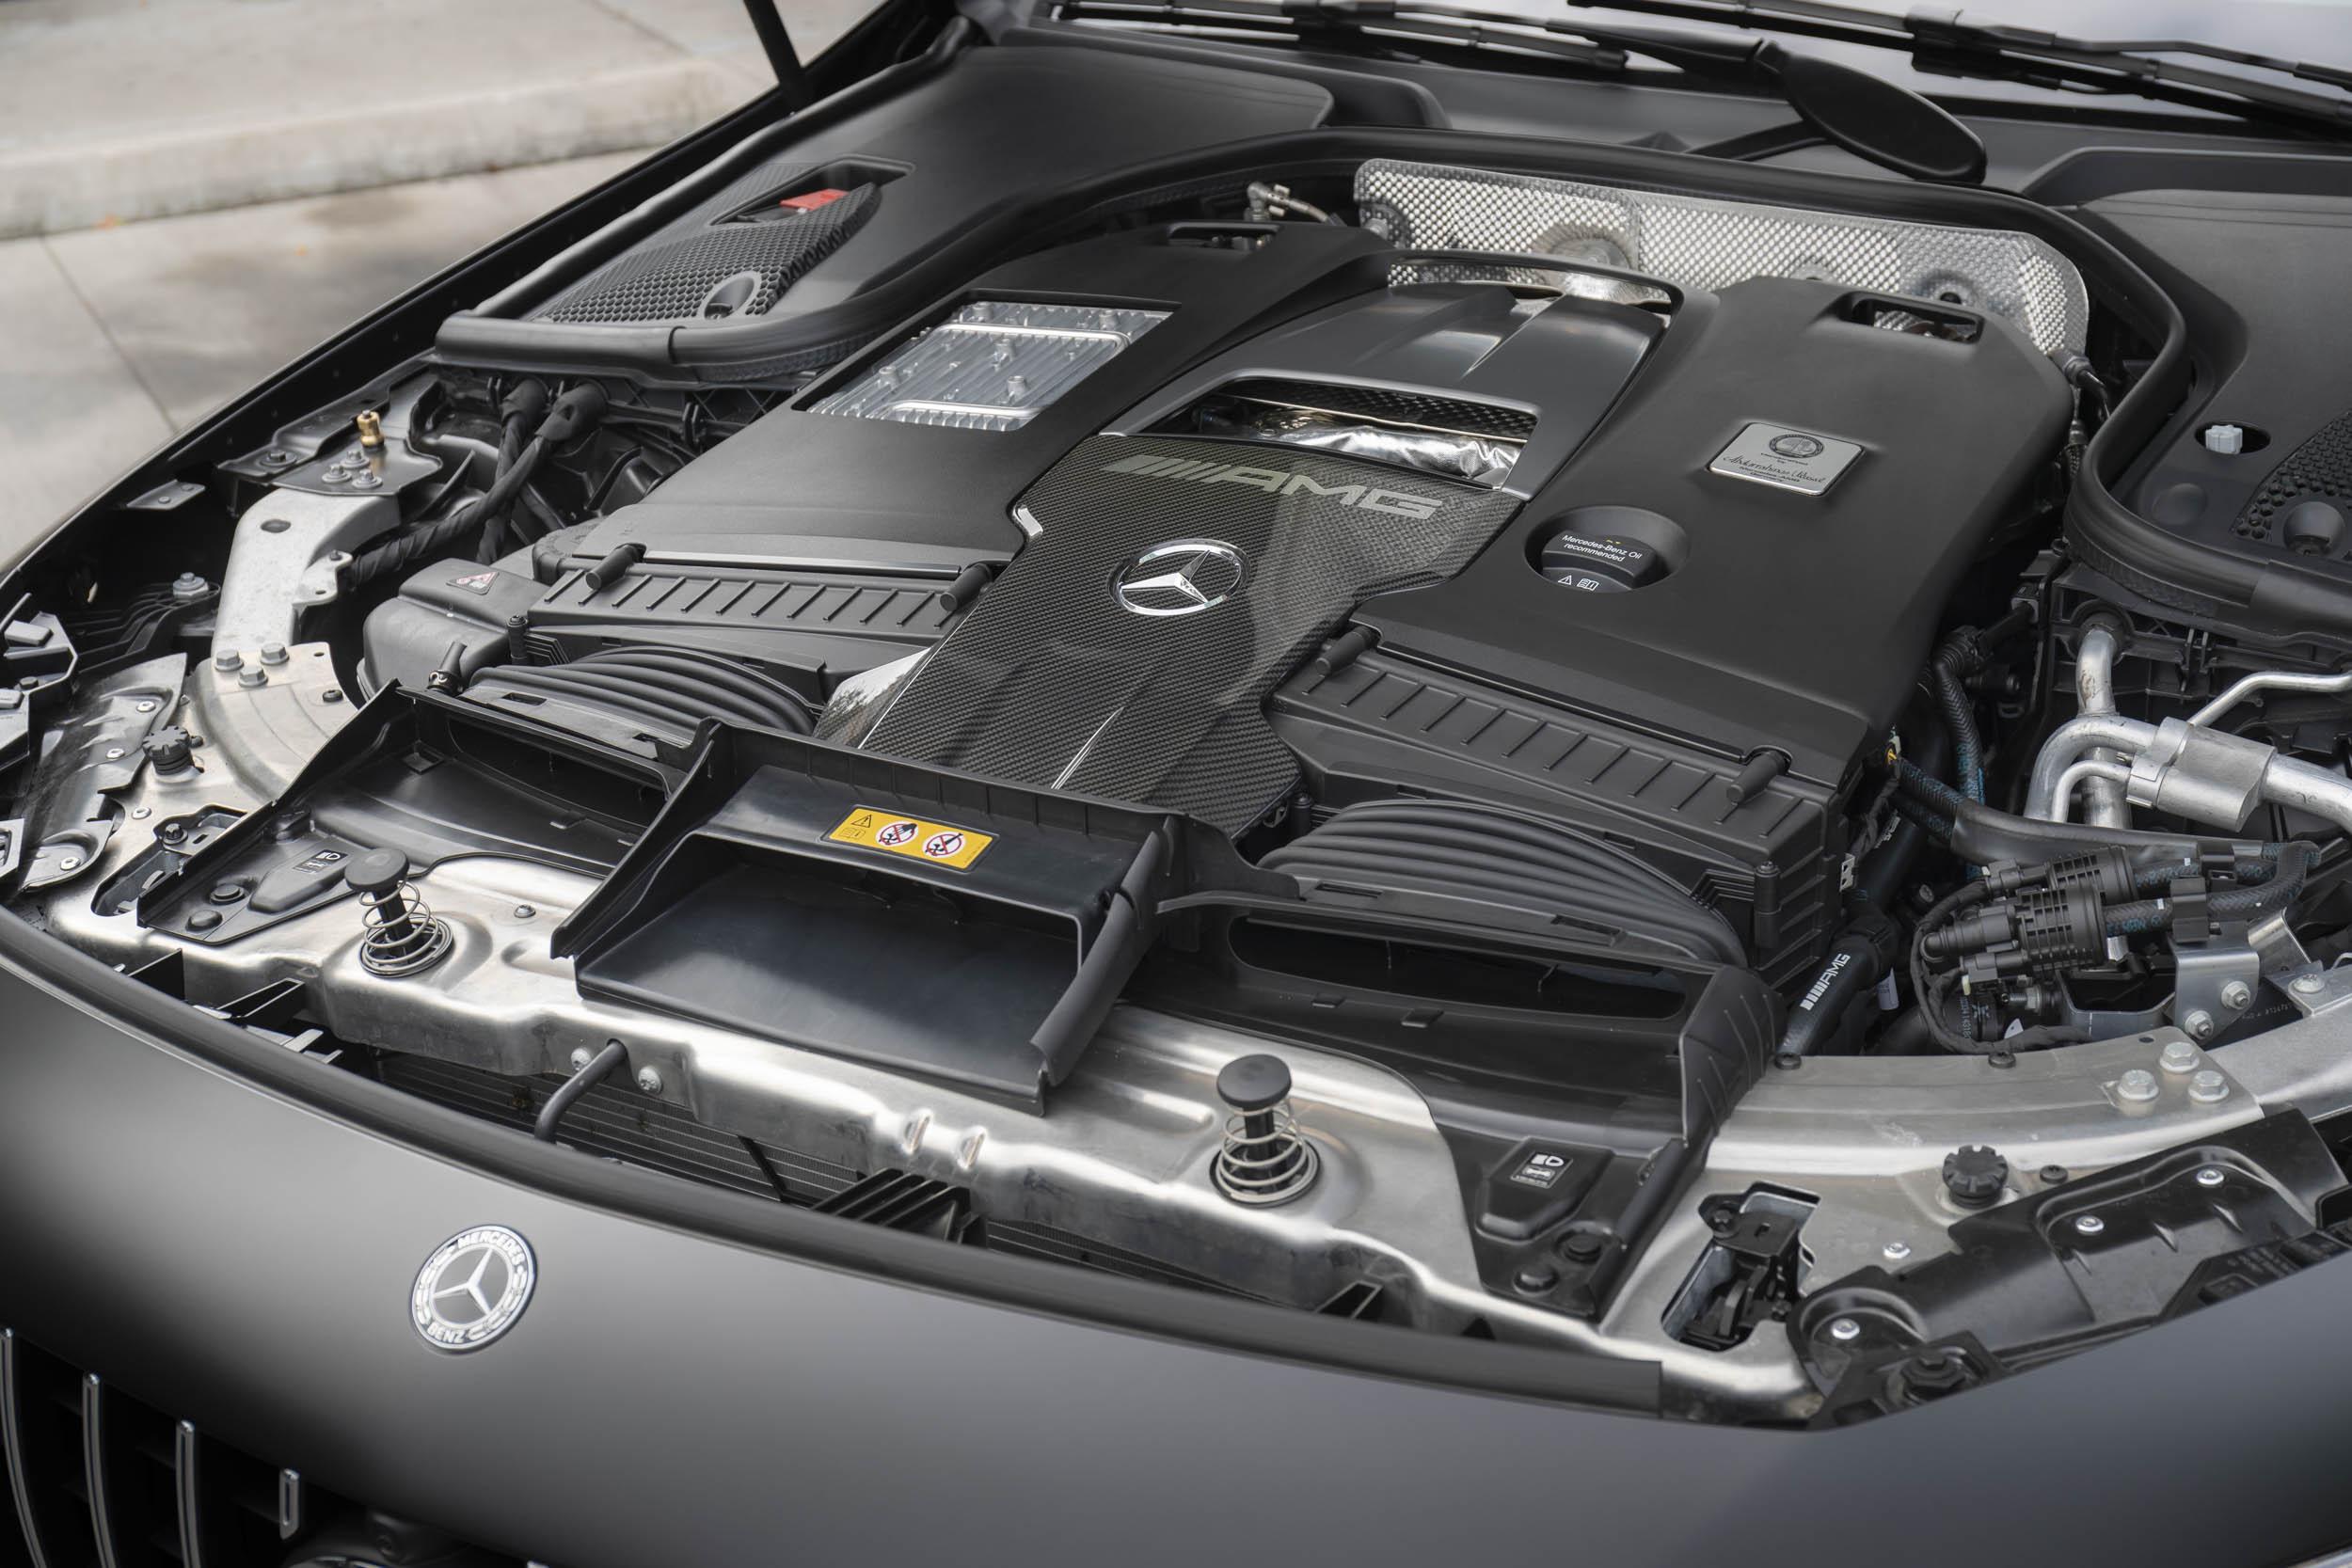 Mercedes-AMG GT 63 S engine